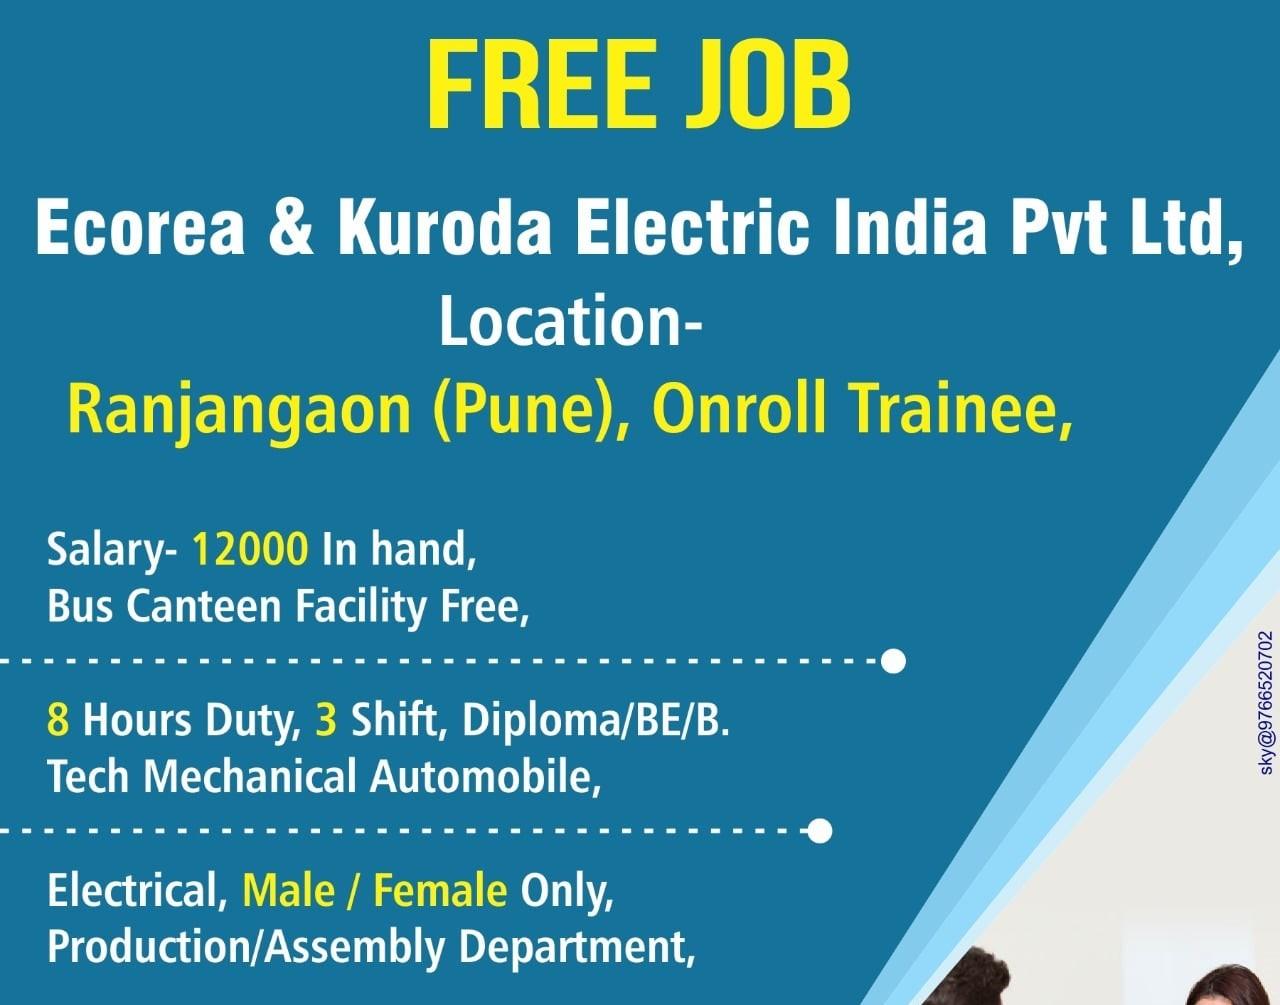 Diploma/BE/B.Tech Jobs Requirement for Ecorea & Kuroda Electric India Pvt Ltd Company at Ranjangaon (Pune) Walk In Drive on 21st April to 30 April 2021